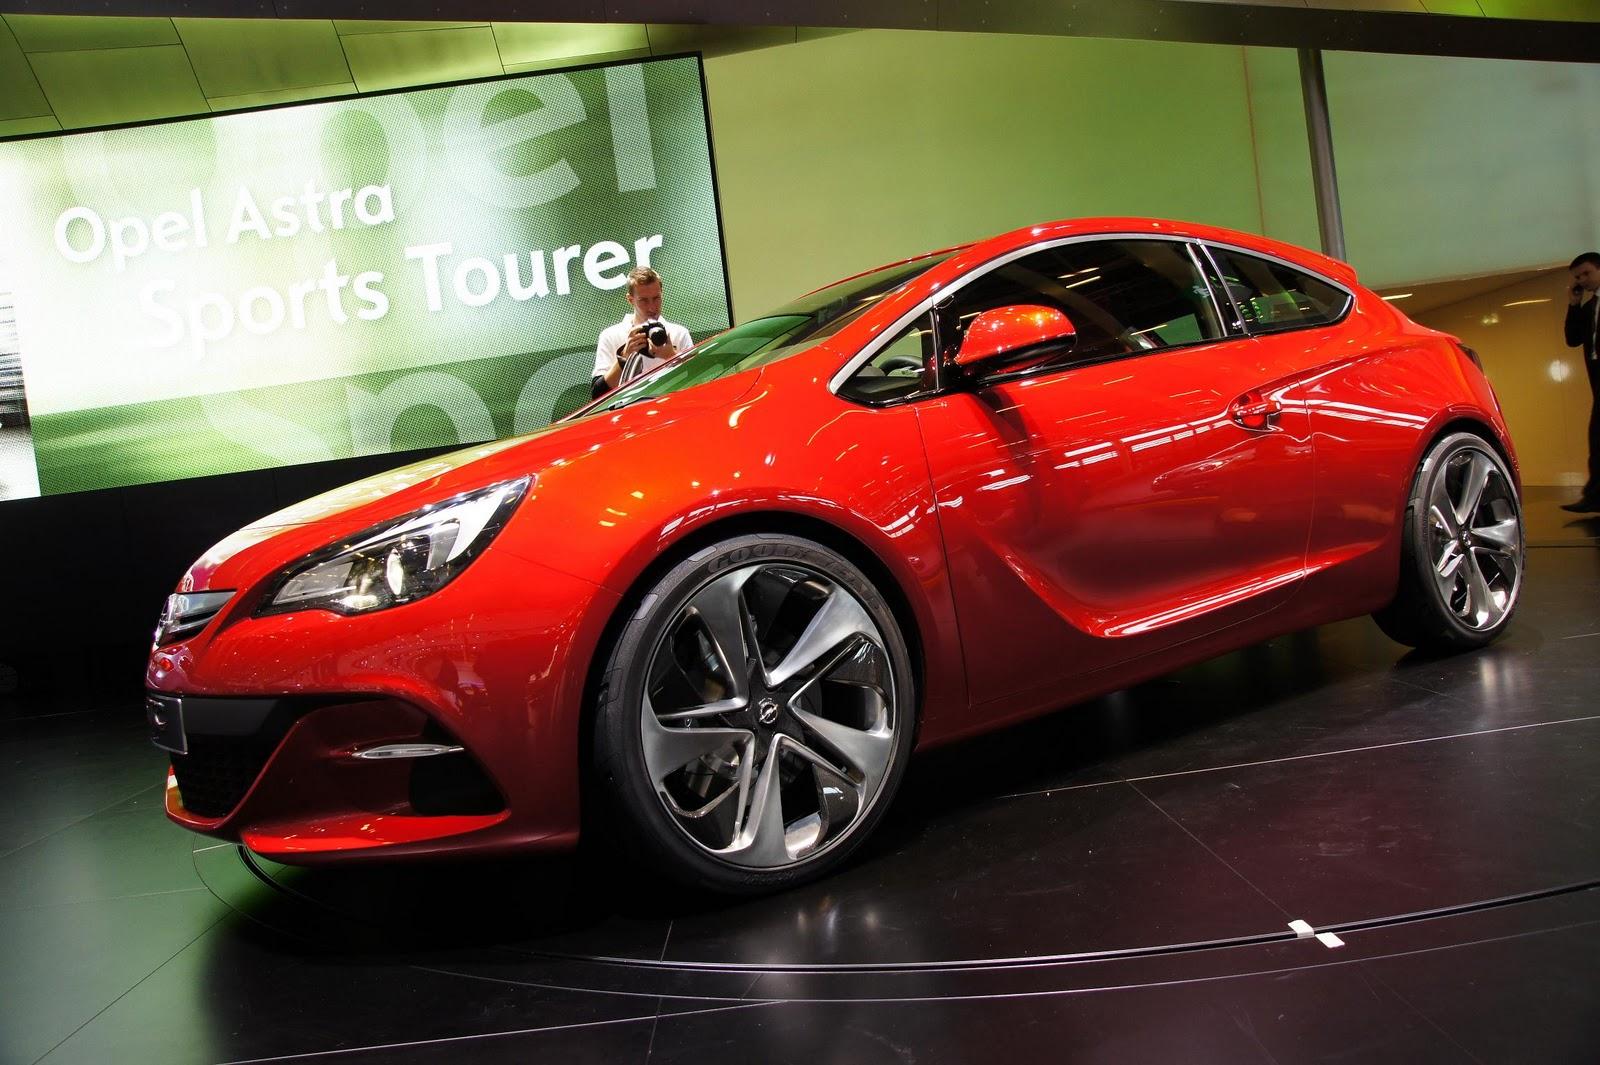 http://4.bp.blogspot.com/_7LQxj656qB0/TLyddr9B6lI/AAAAAAAAJYY/95SkMKyOEZ0/s1600/2011%20Vauxhall_Opel%20Astra%20GTC%201.jpg